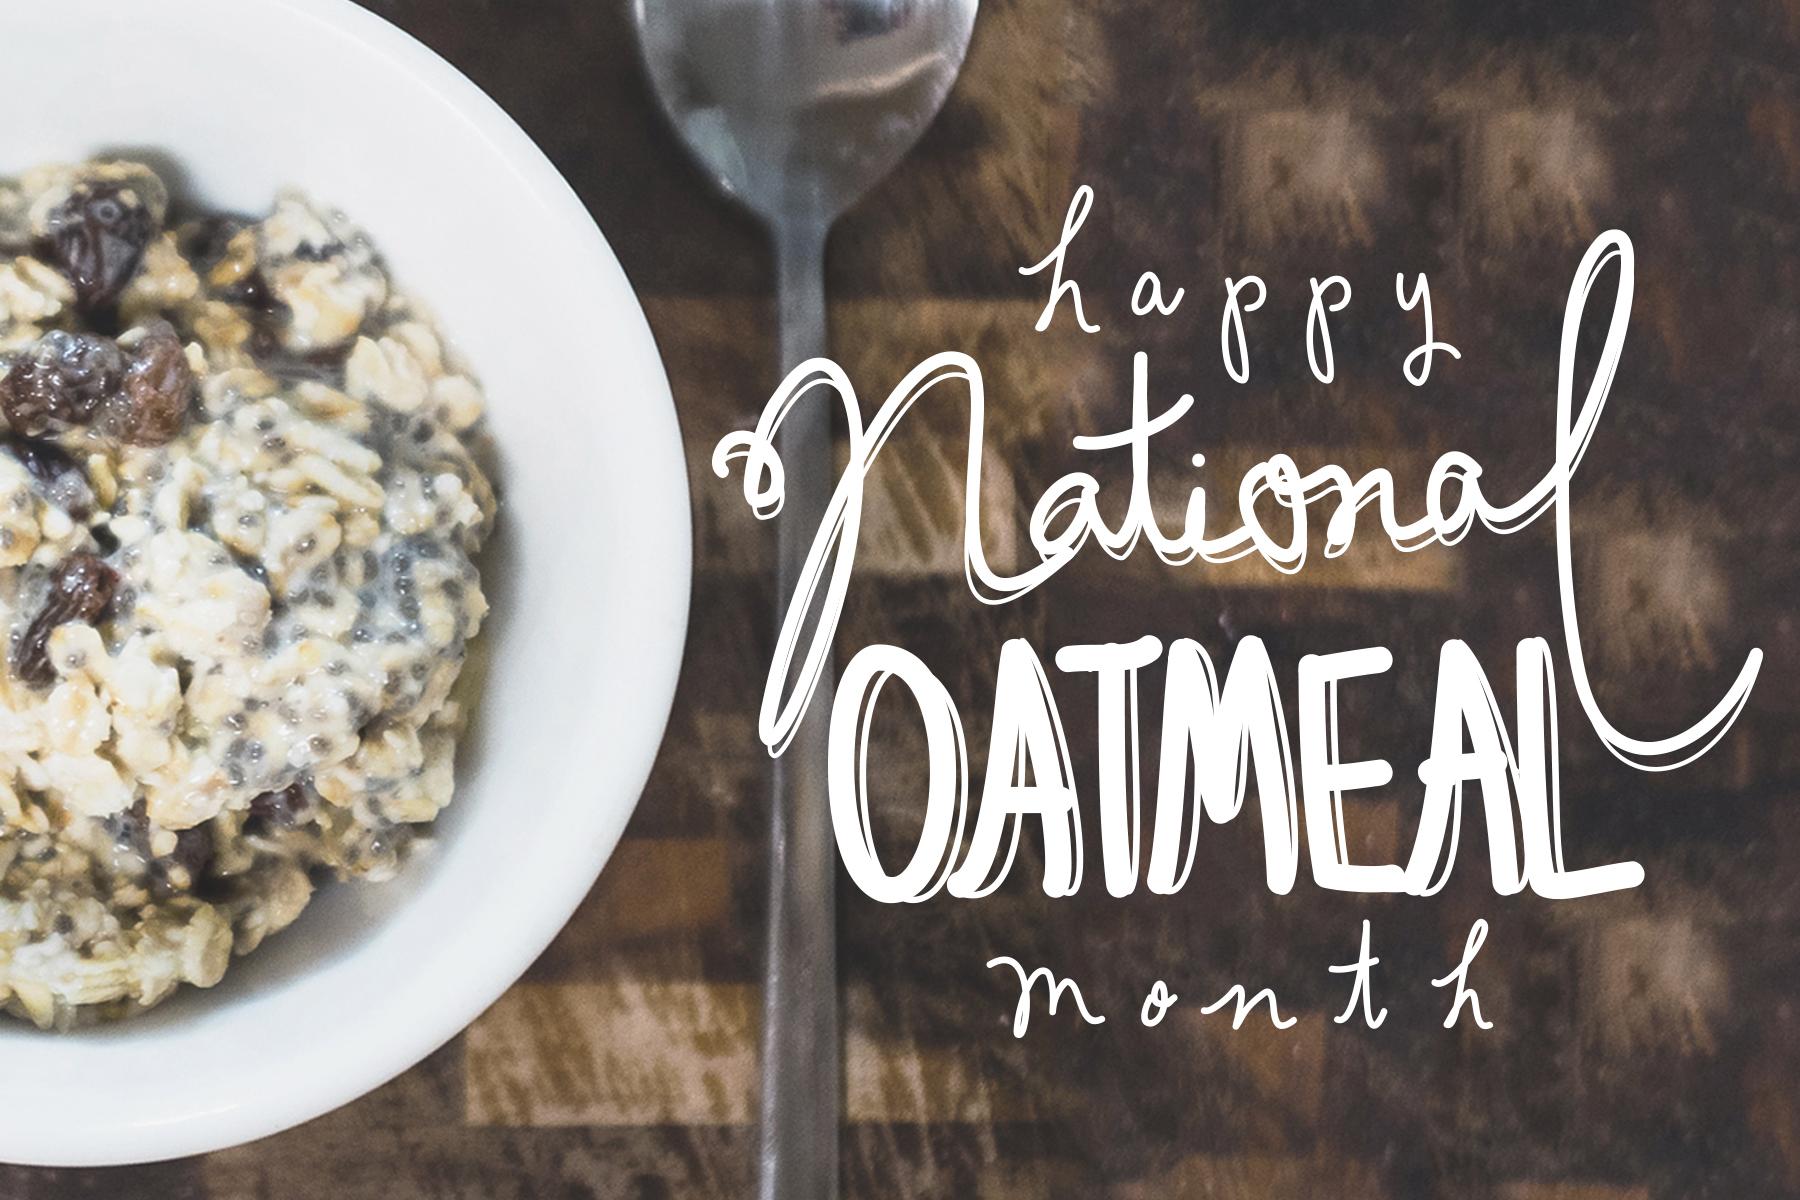 sohostory-oatmeal-1